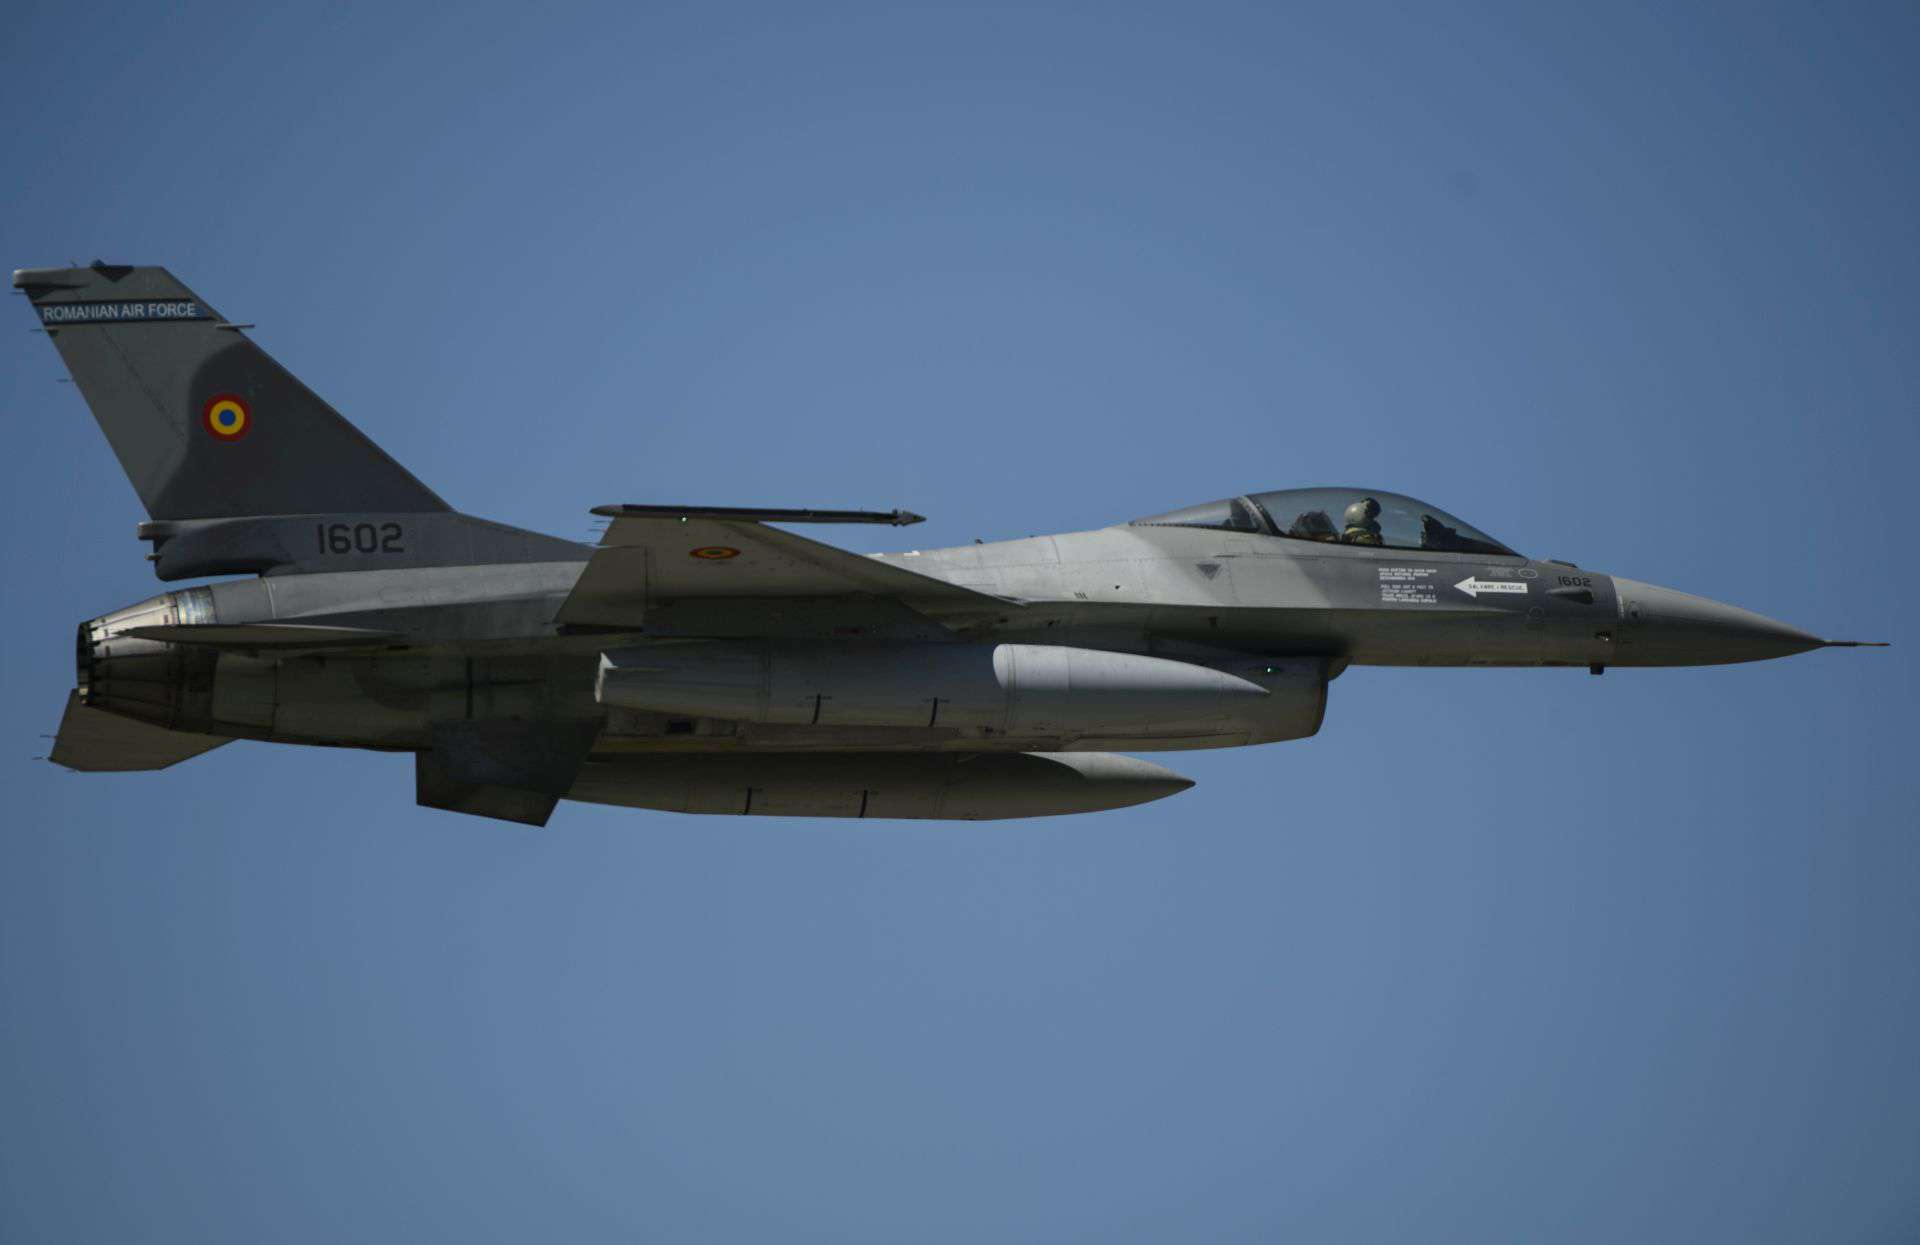 Romanian Air Force F-16 Jet